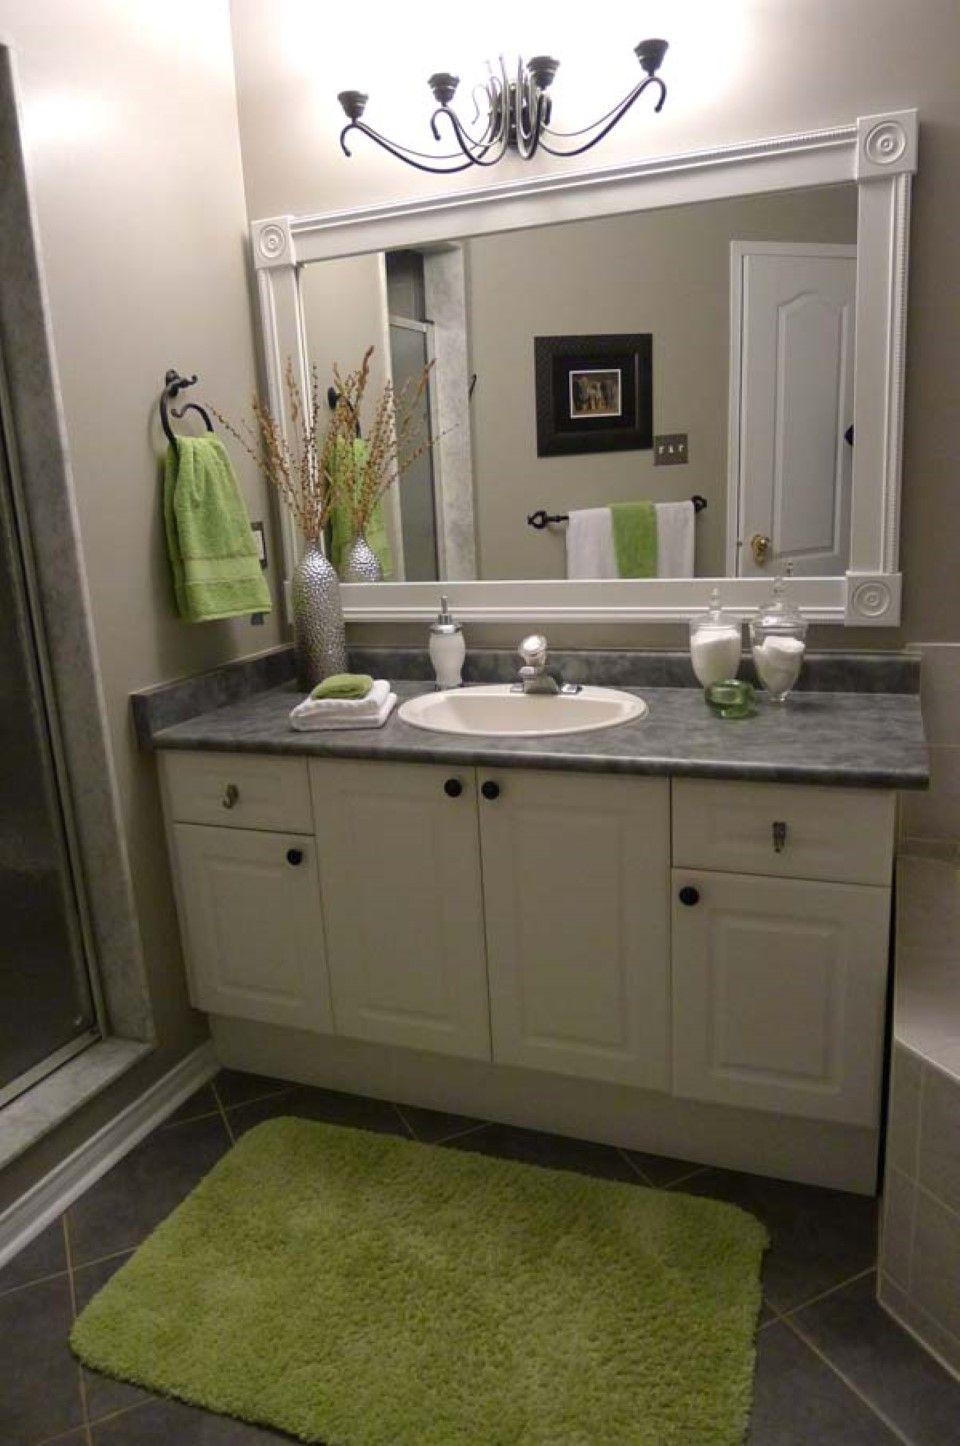 Bathroom Small Green Rug On Black Ceramic Floor Tile ...